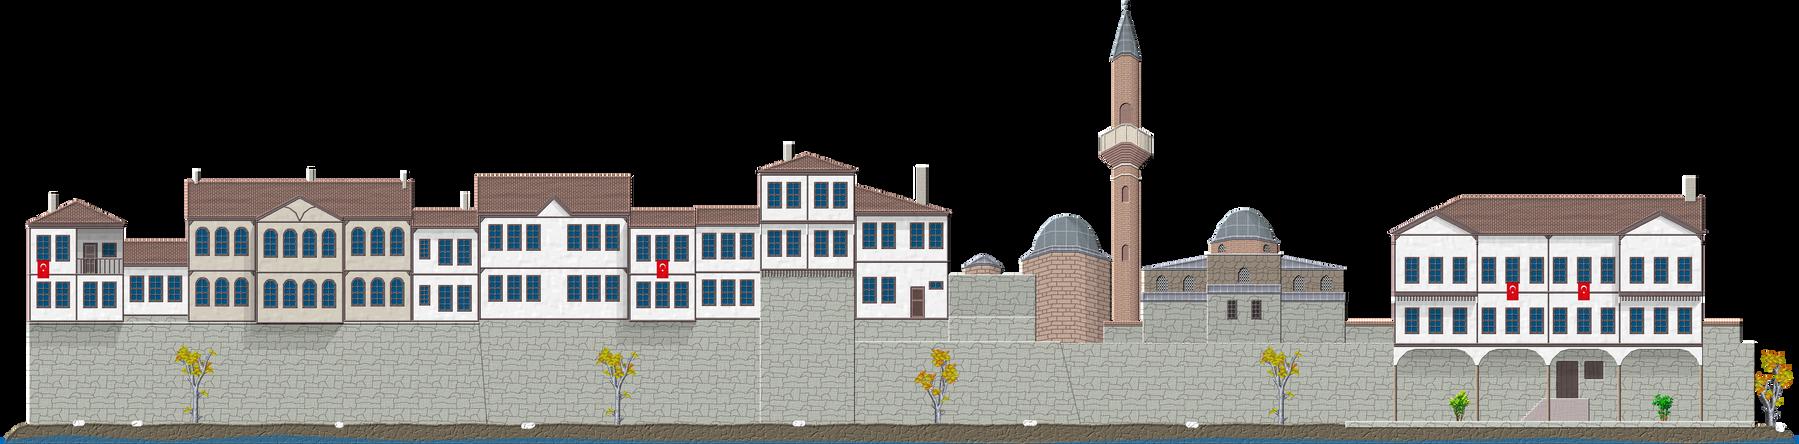 Amasya Houses by Herbertrocha